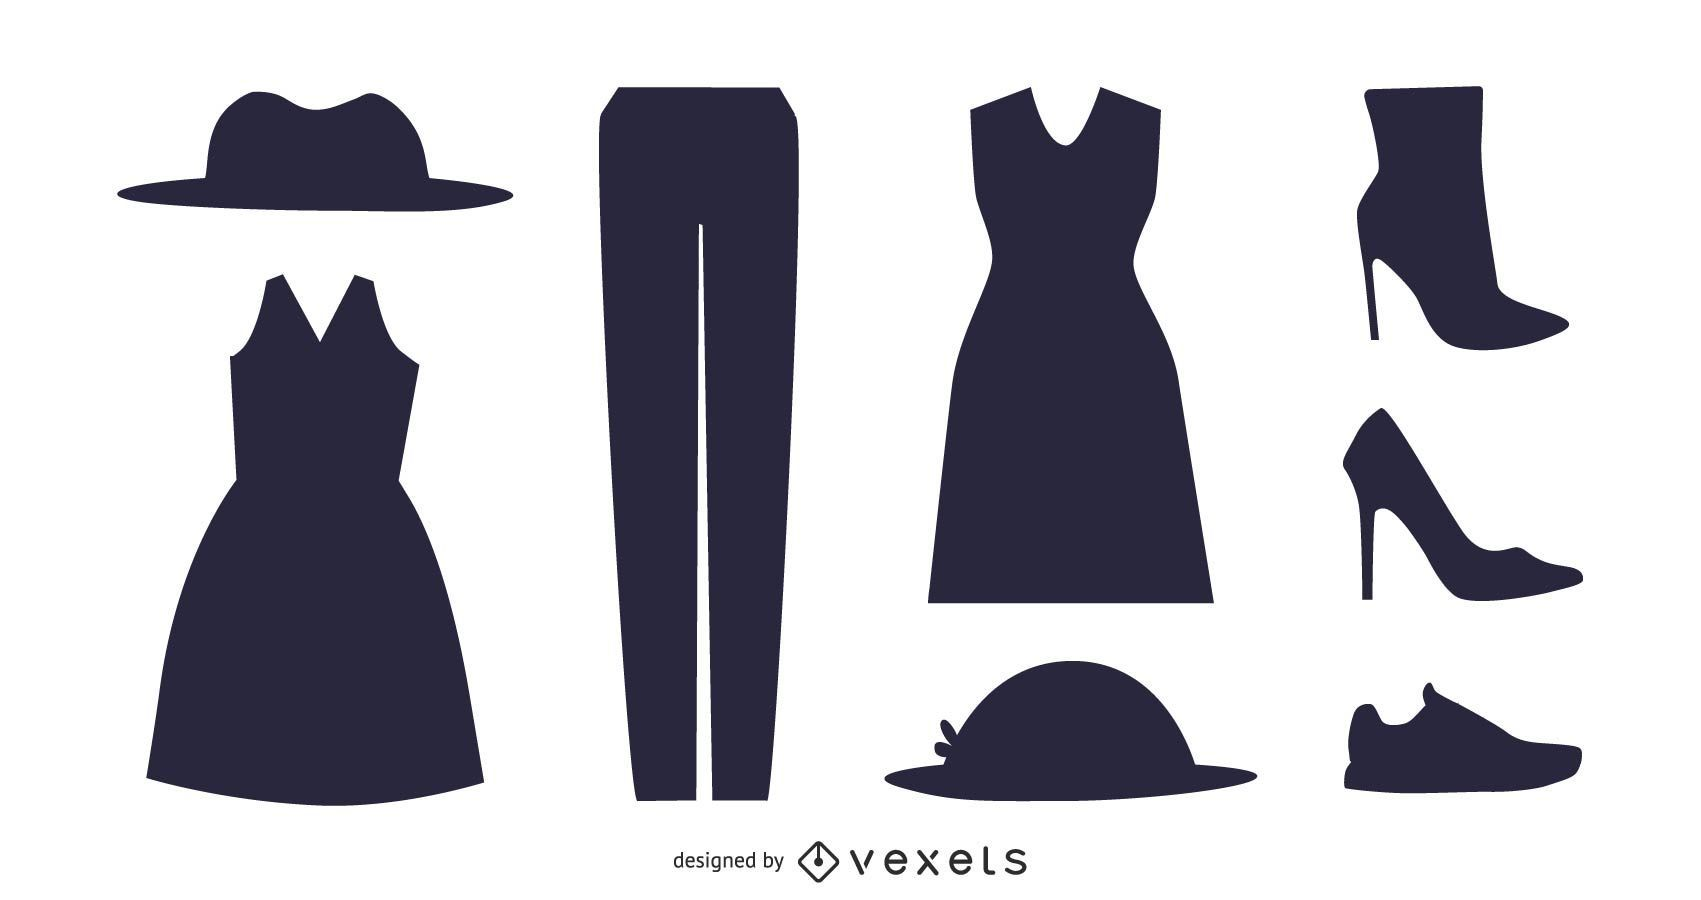 Pacote de acessórios de moda feminina silhueta